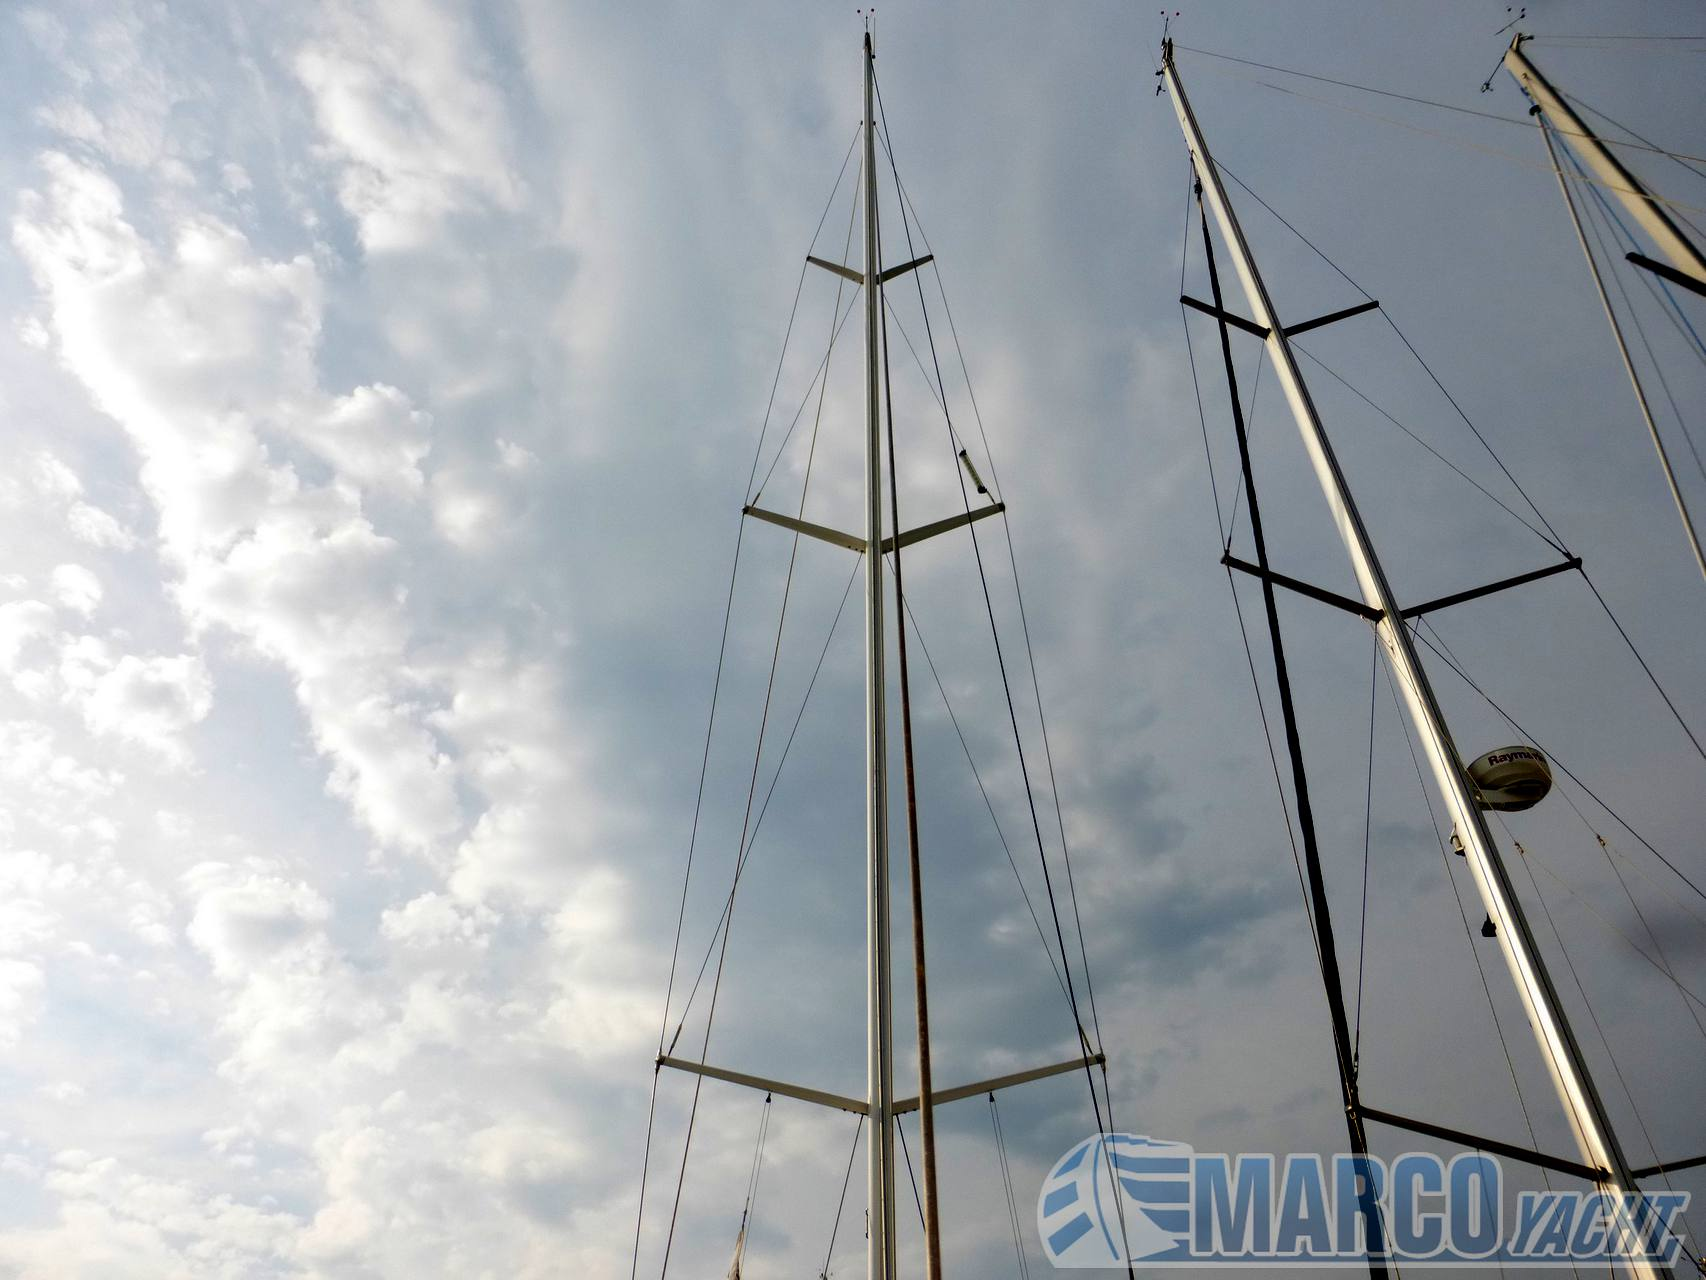 X-yacht X 40 Sail cruiser used